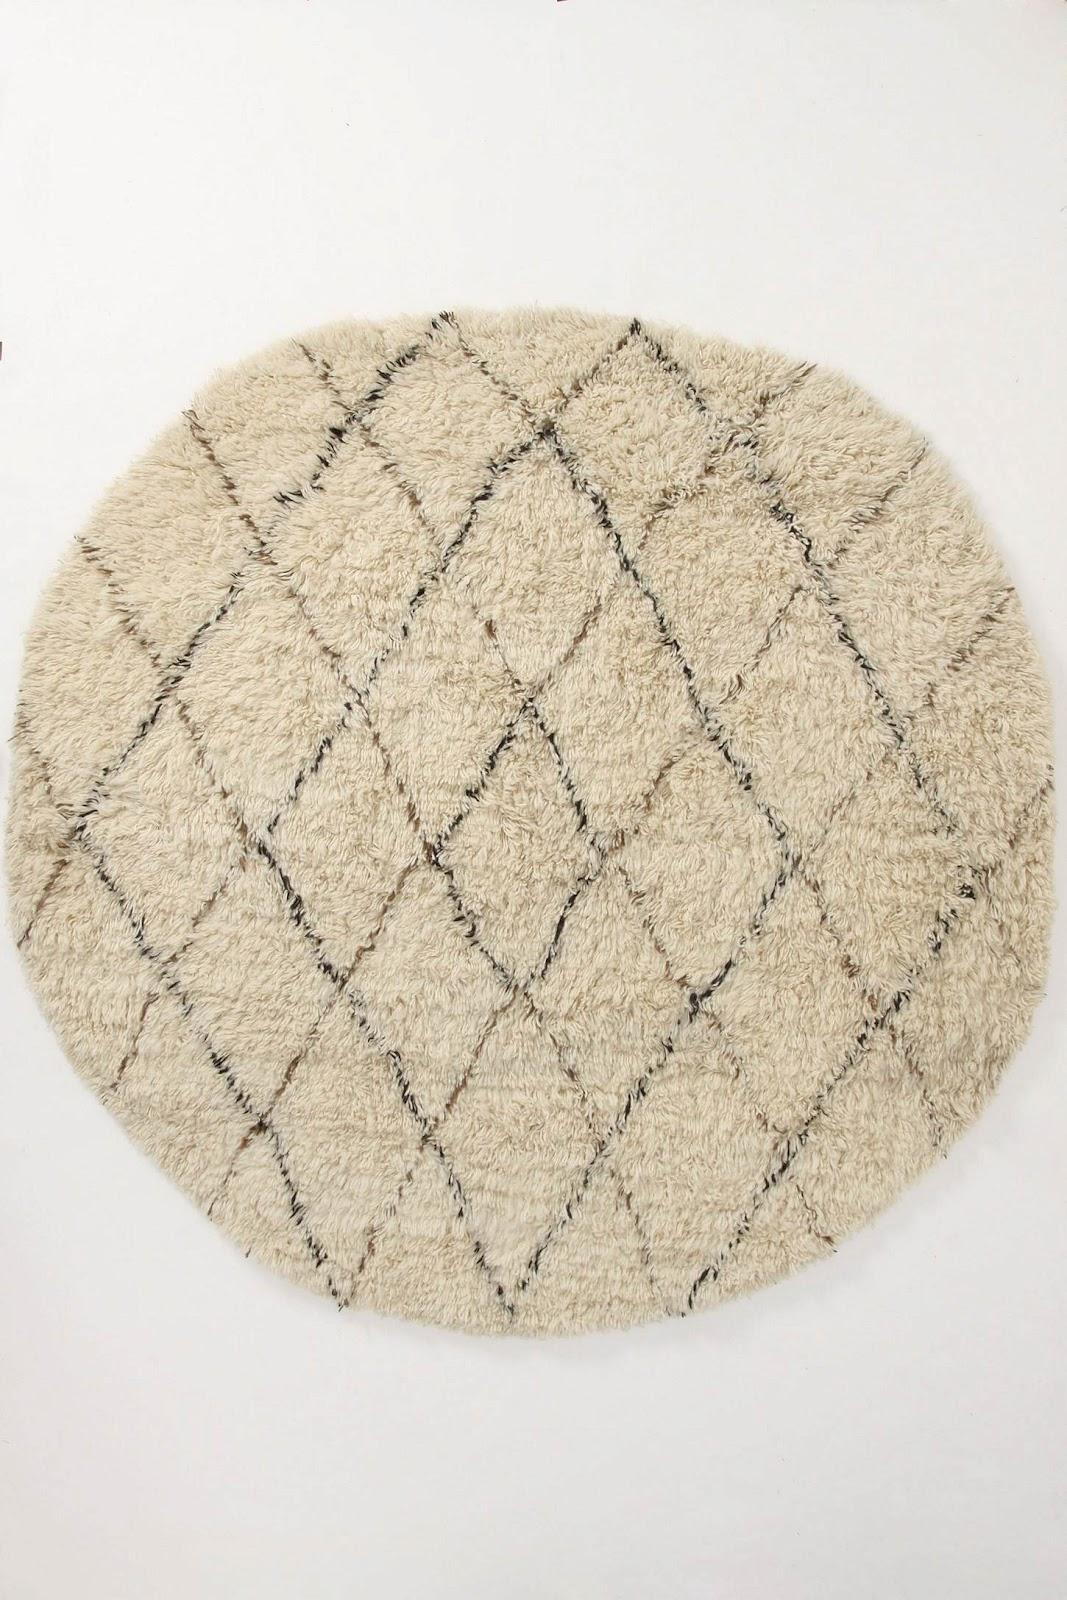 sassabs I am crazy about the souk rug